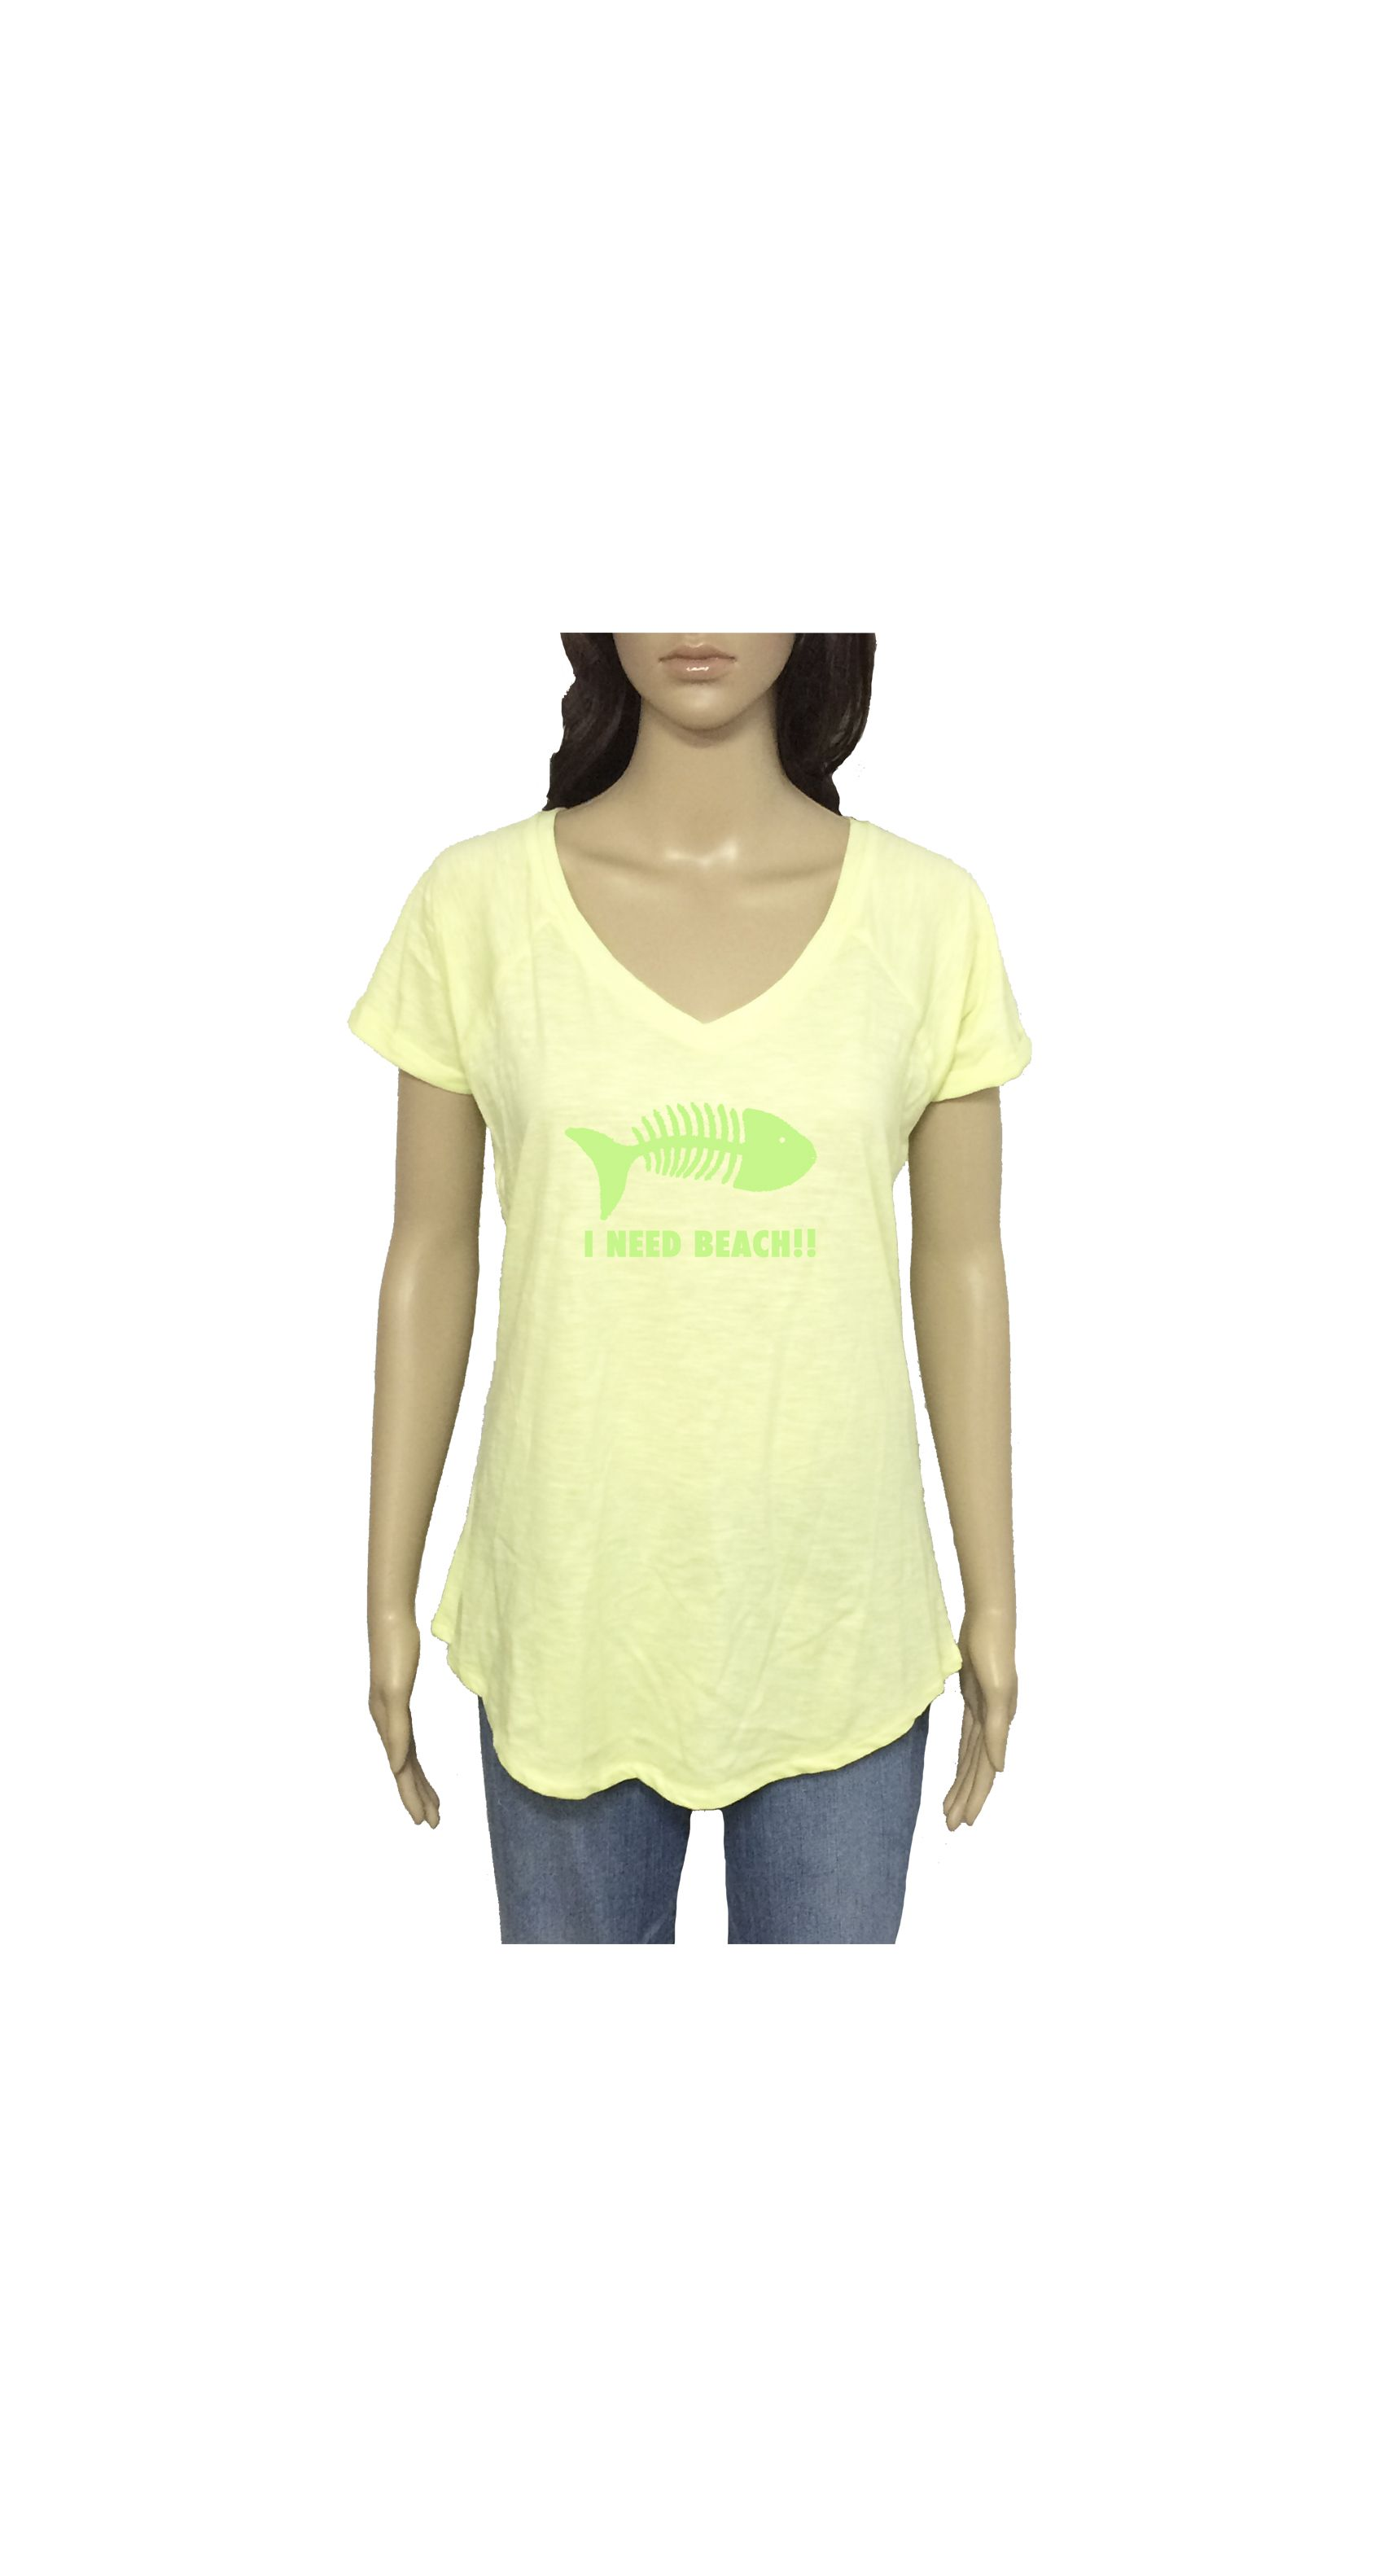 "Camiseta ""I need beach"" www.smartyfun.es #camiseta #playa #beach #amarillo #pez #fish"